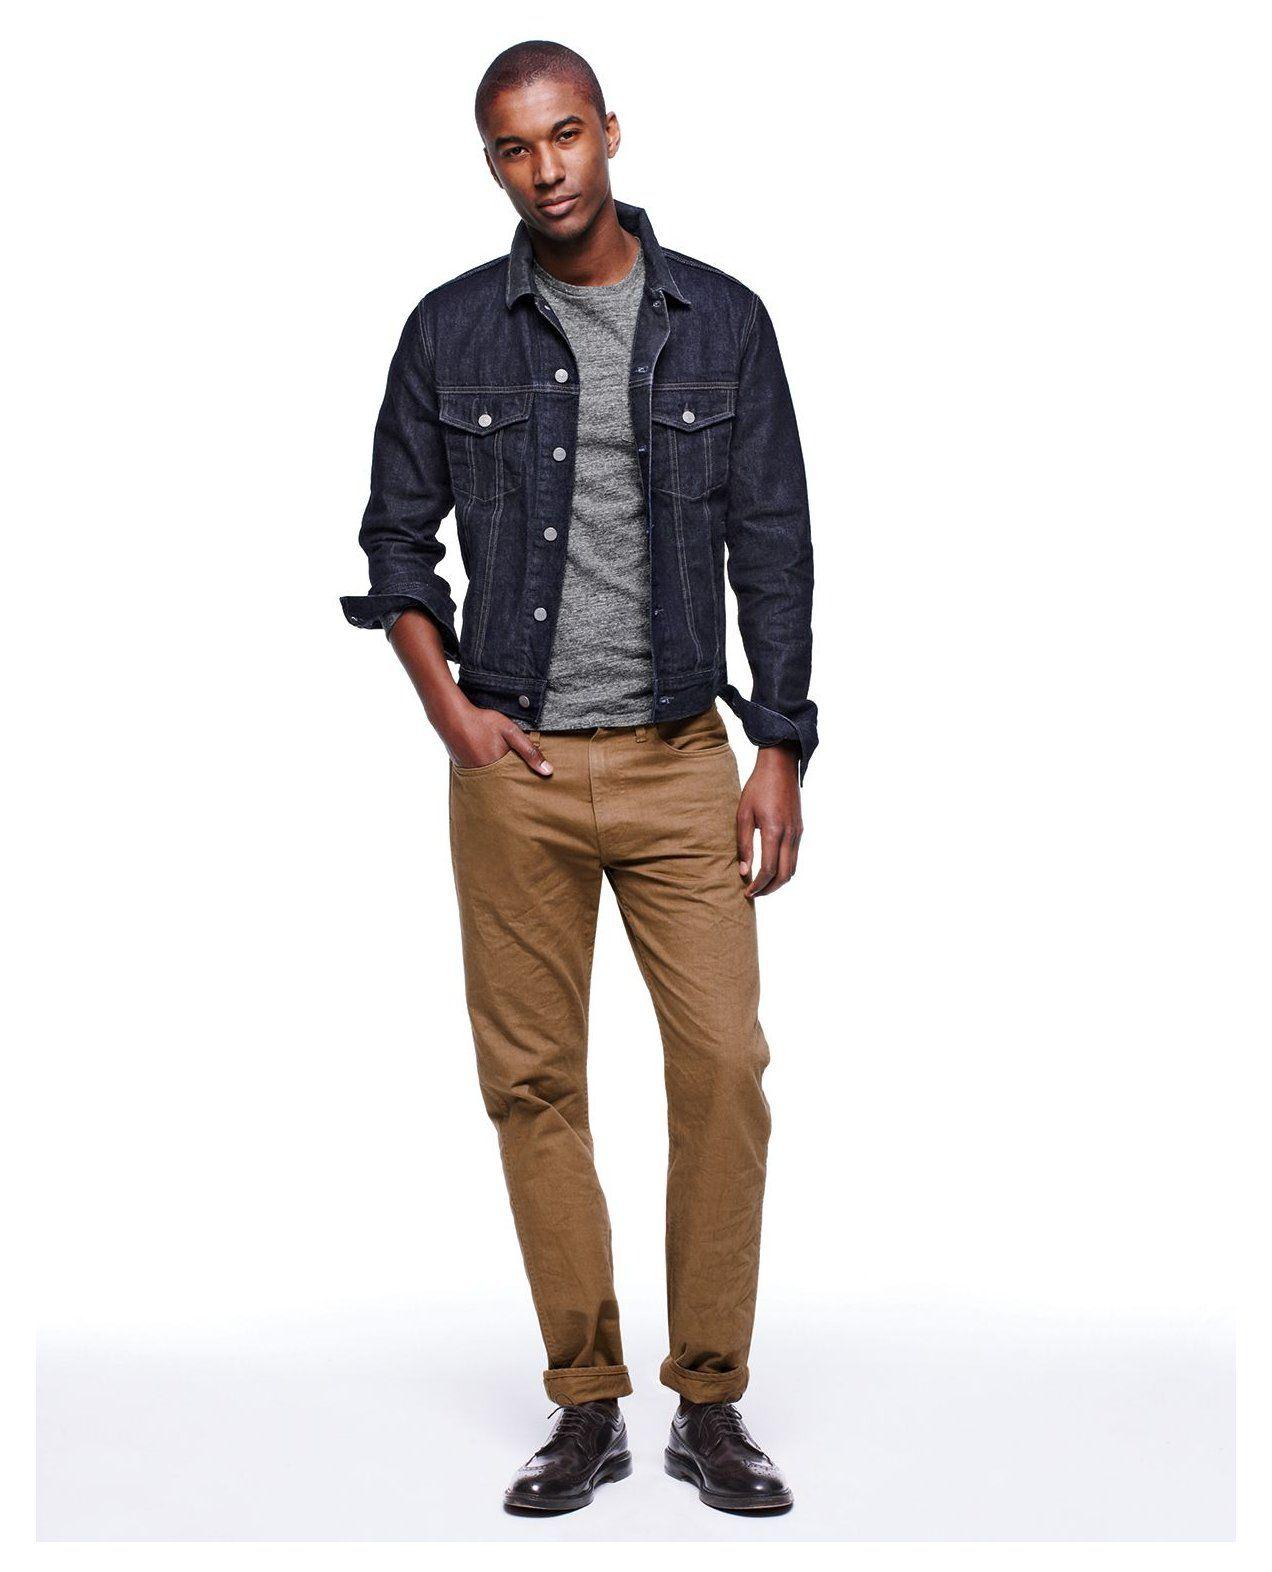 Men S Shirts Jeans Shoes More Men S New Arrivals Tan Jean Jacket Outfit Men Tanjeanjacketout Jean Jacket Outfits Men Men S Denim Style Mens Outfits [ 1572 x 1272 Pixel ]